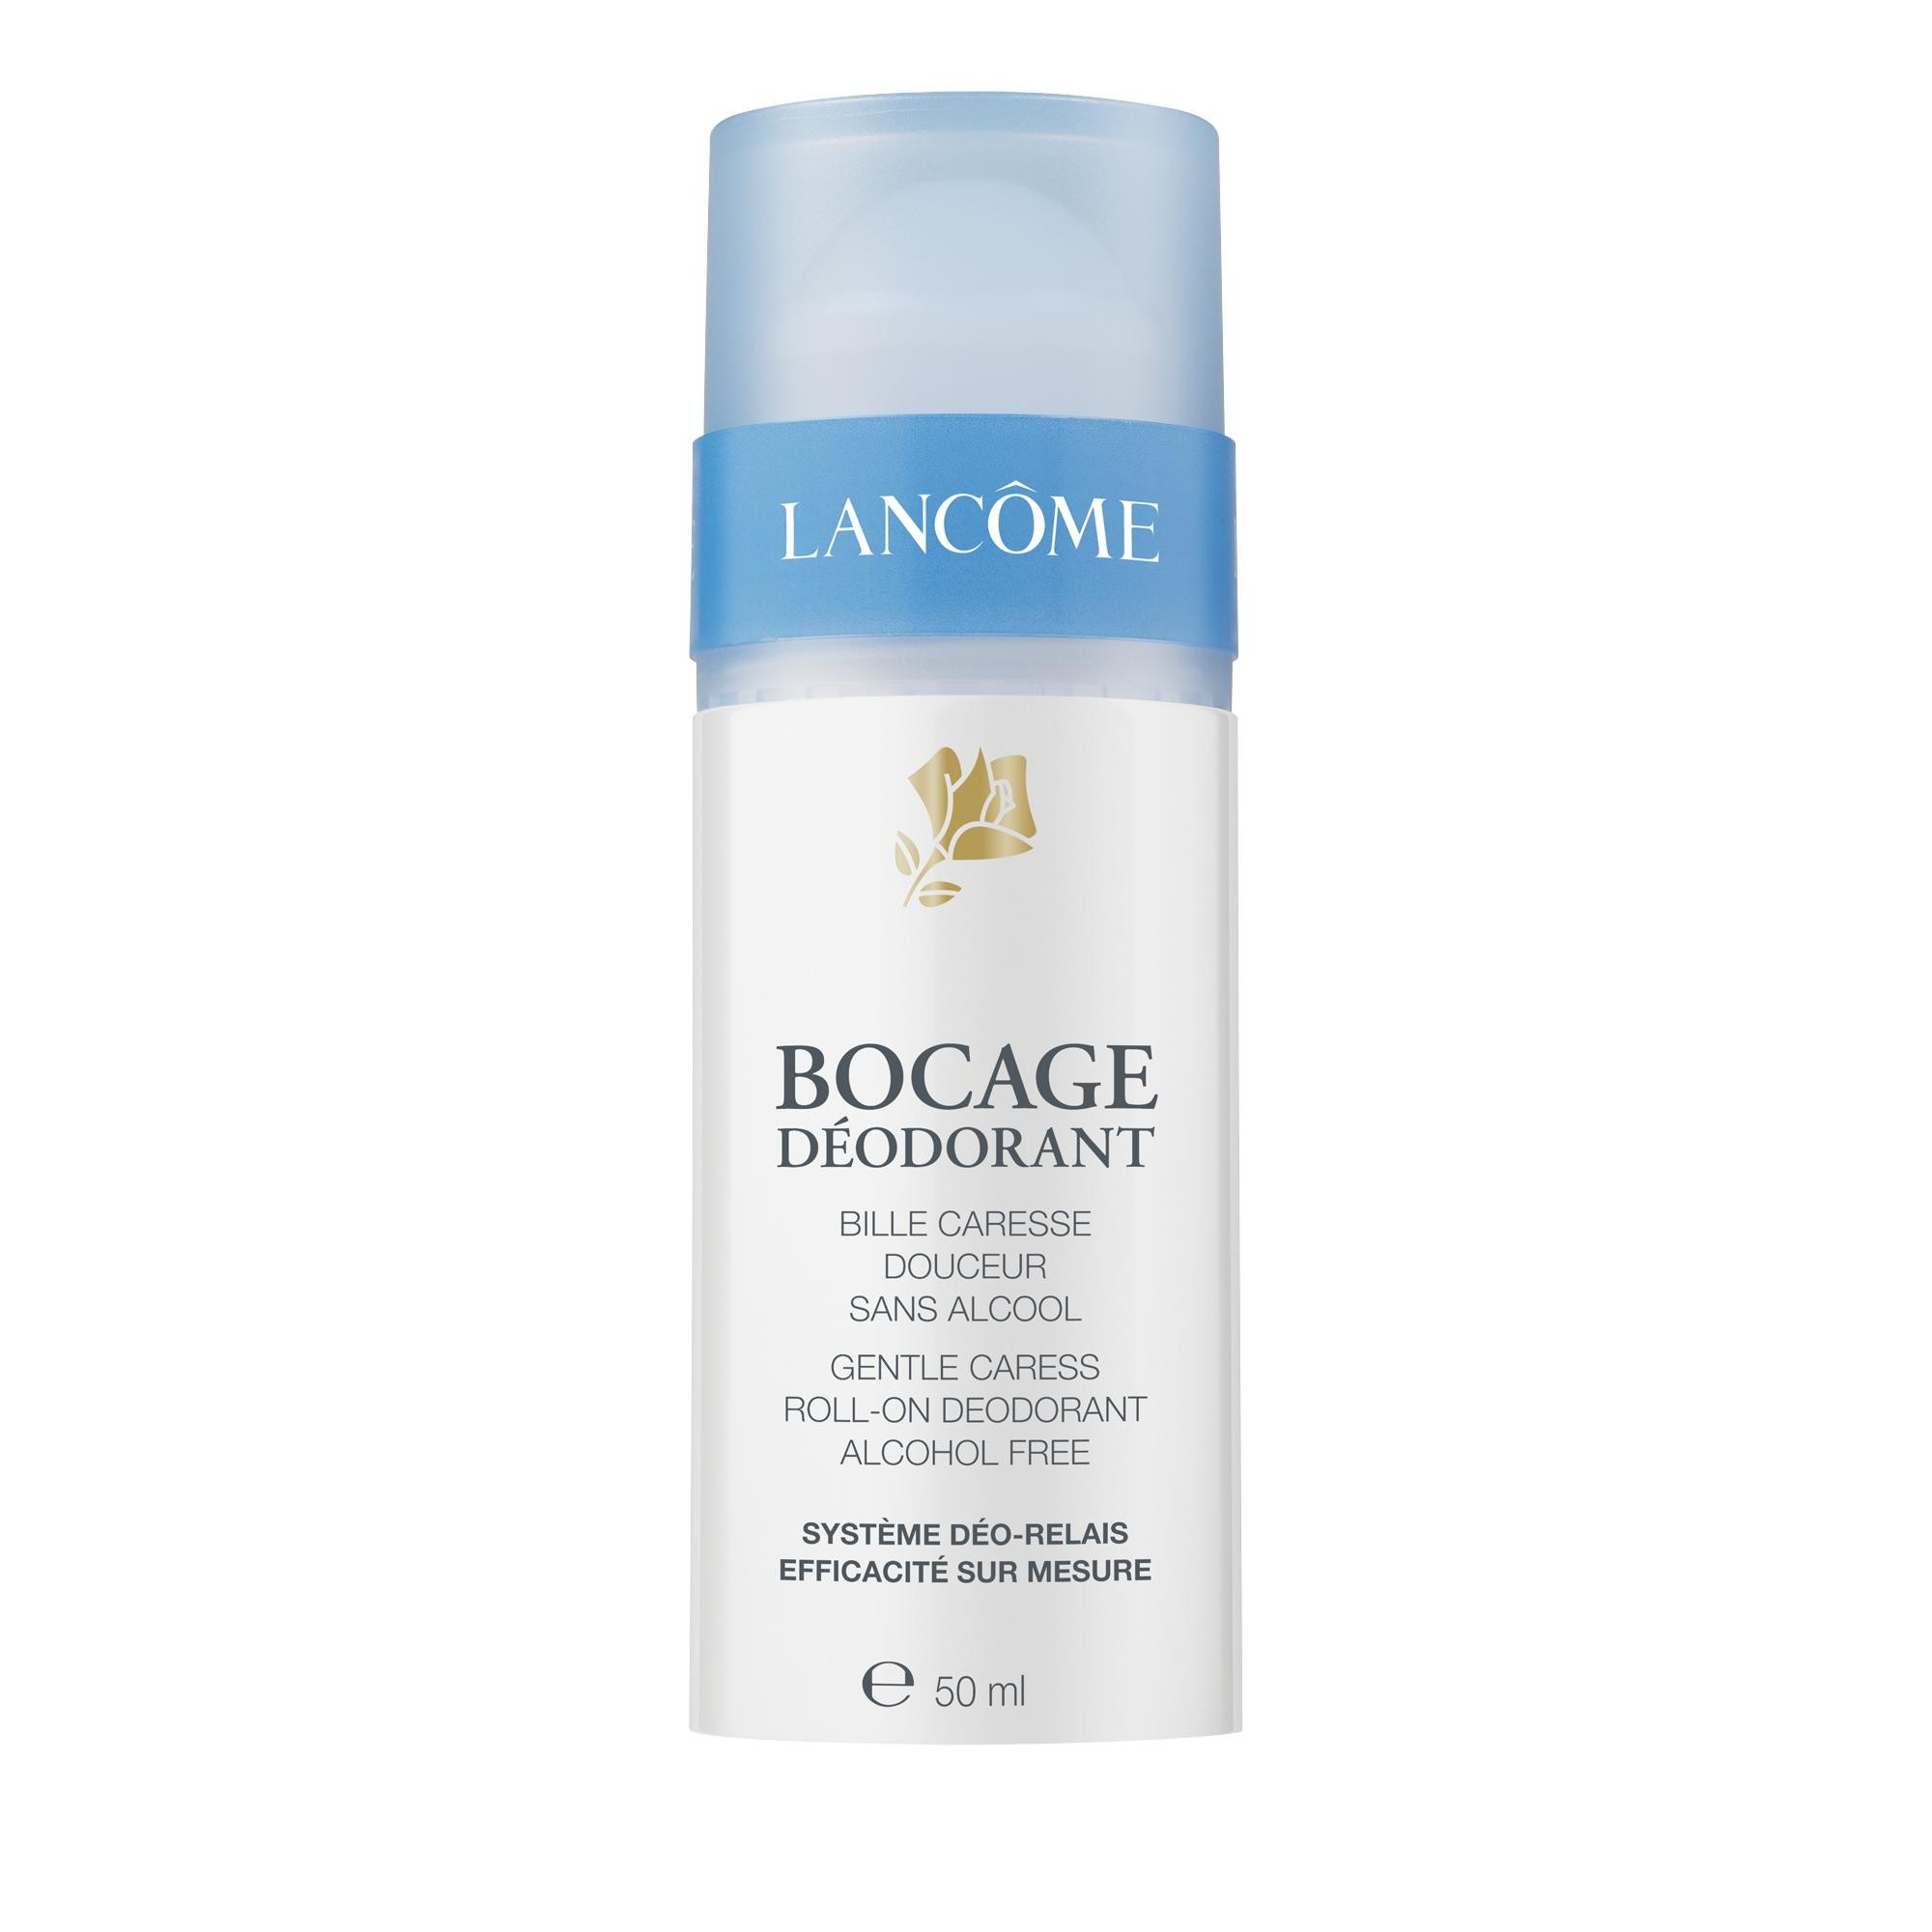 Lancôme Bocage Unisex Deodorante roll-on 50 ml 1 pezzo(i)